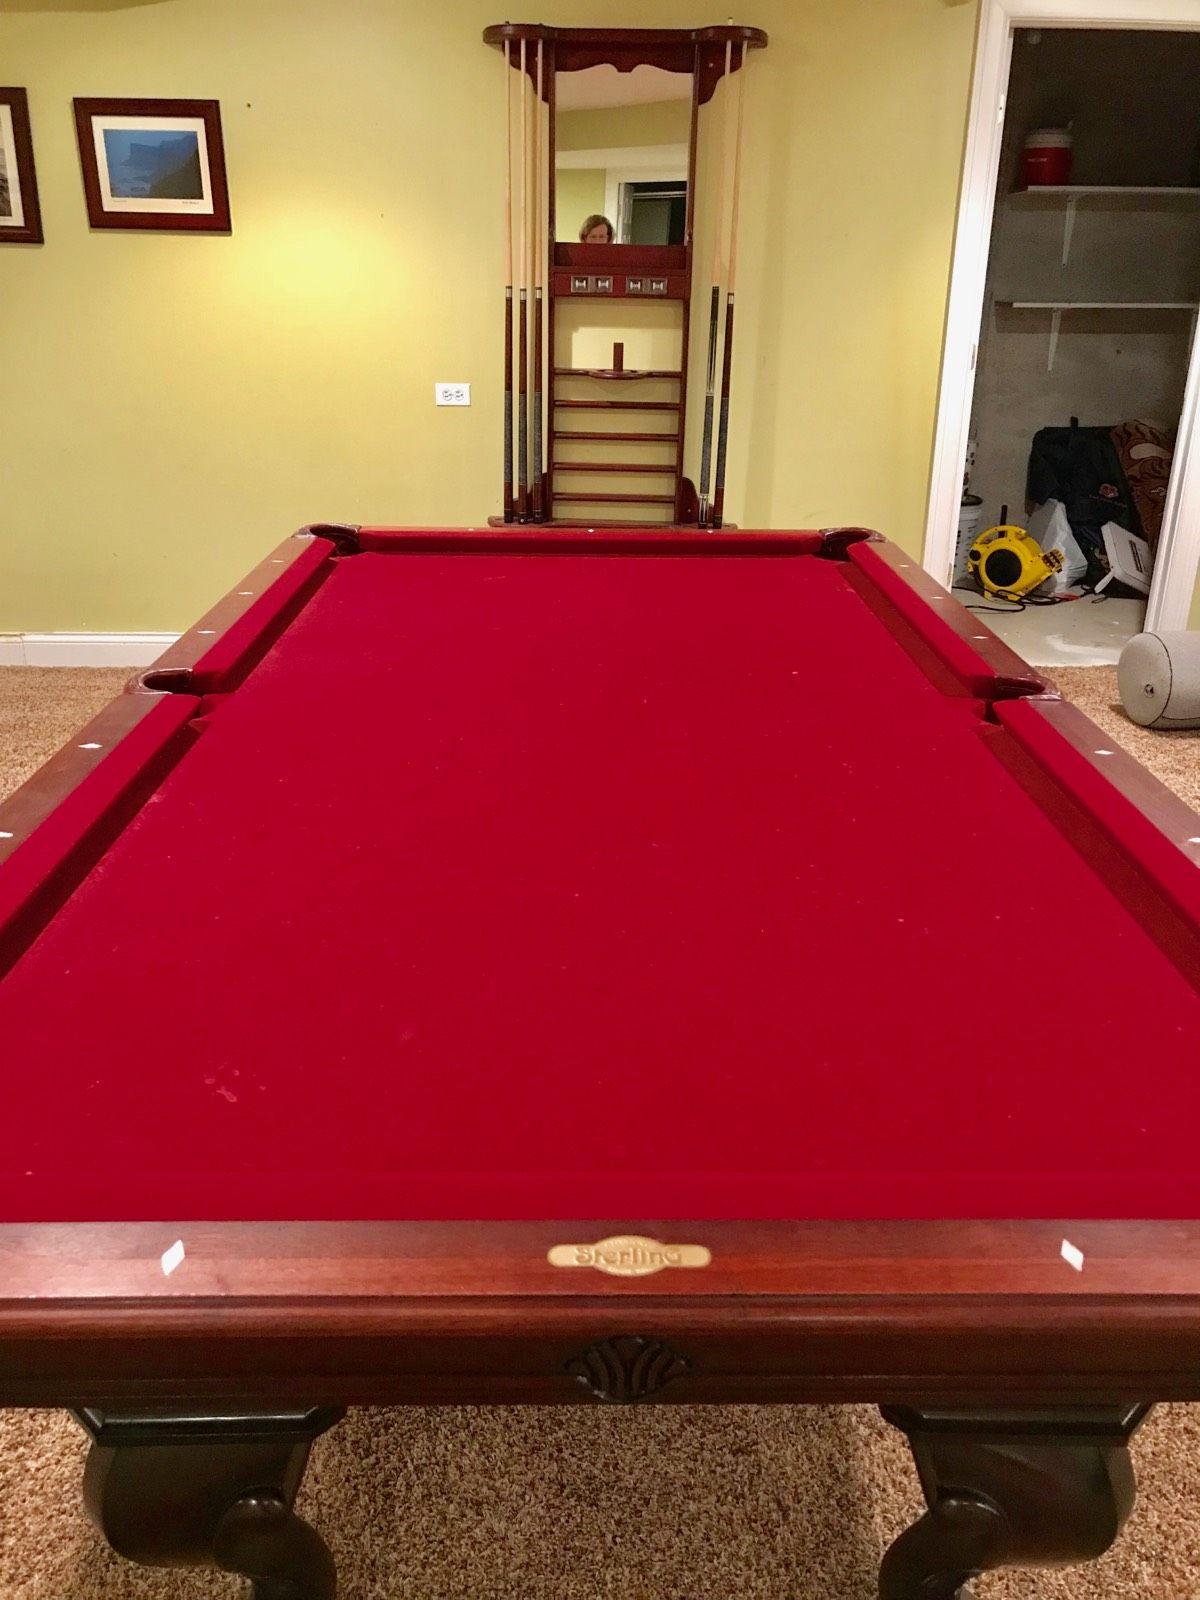 8 Vitallie Sterling Billiards Solid Wood Billiard Pool